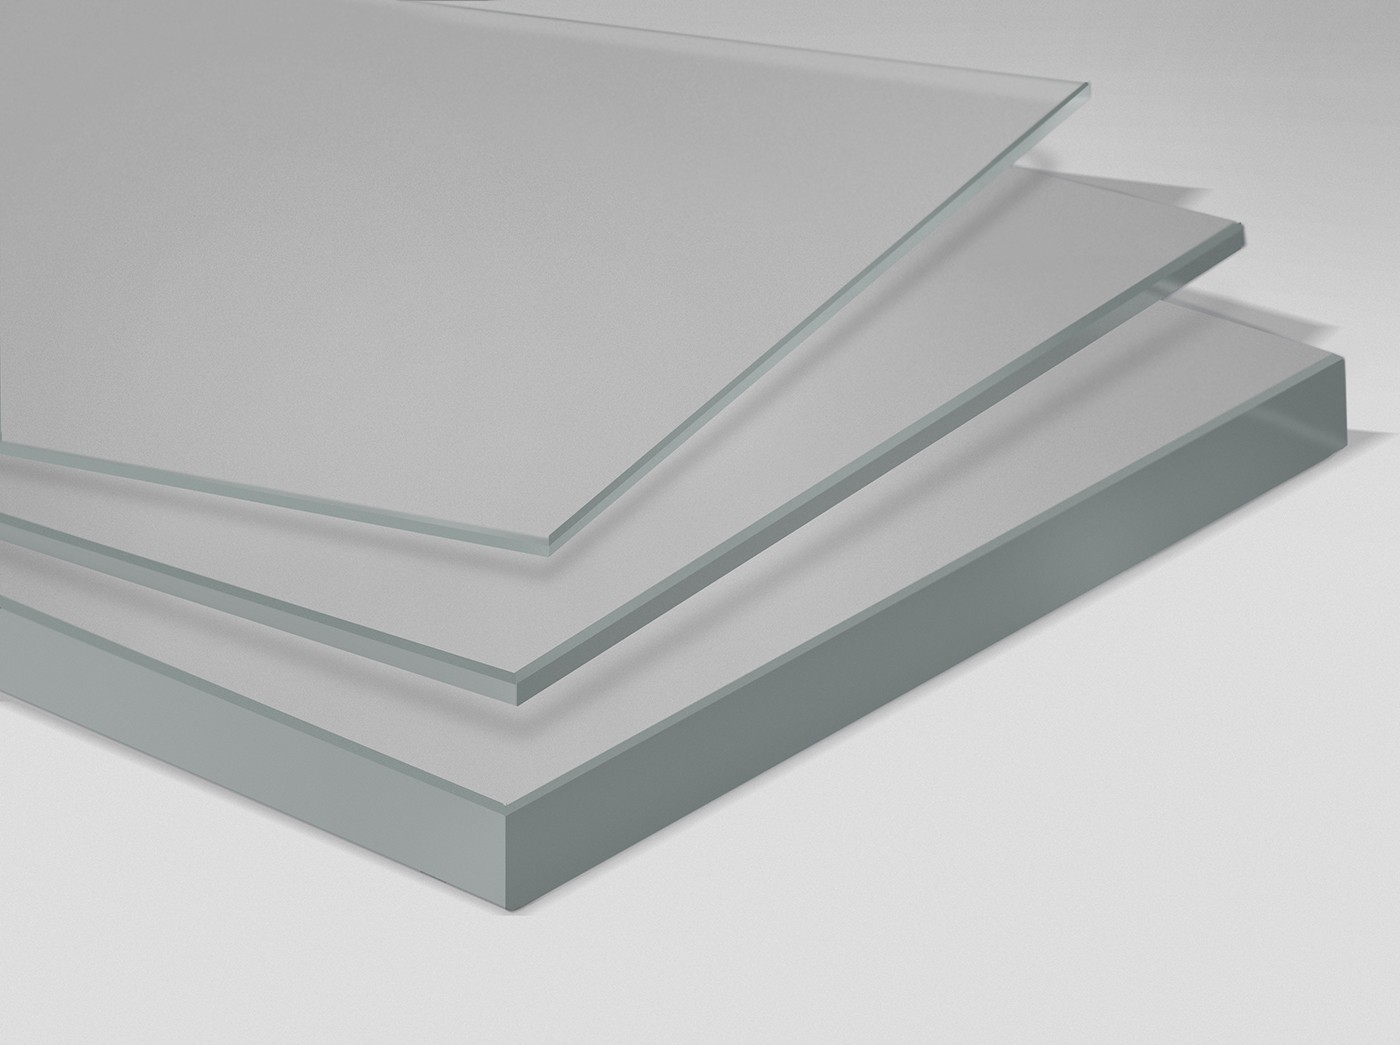 vsg glas 8mm matt, vsg 8mm 2 folien matt - glaserei jansen onlineshop, Design ideen